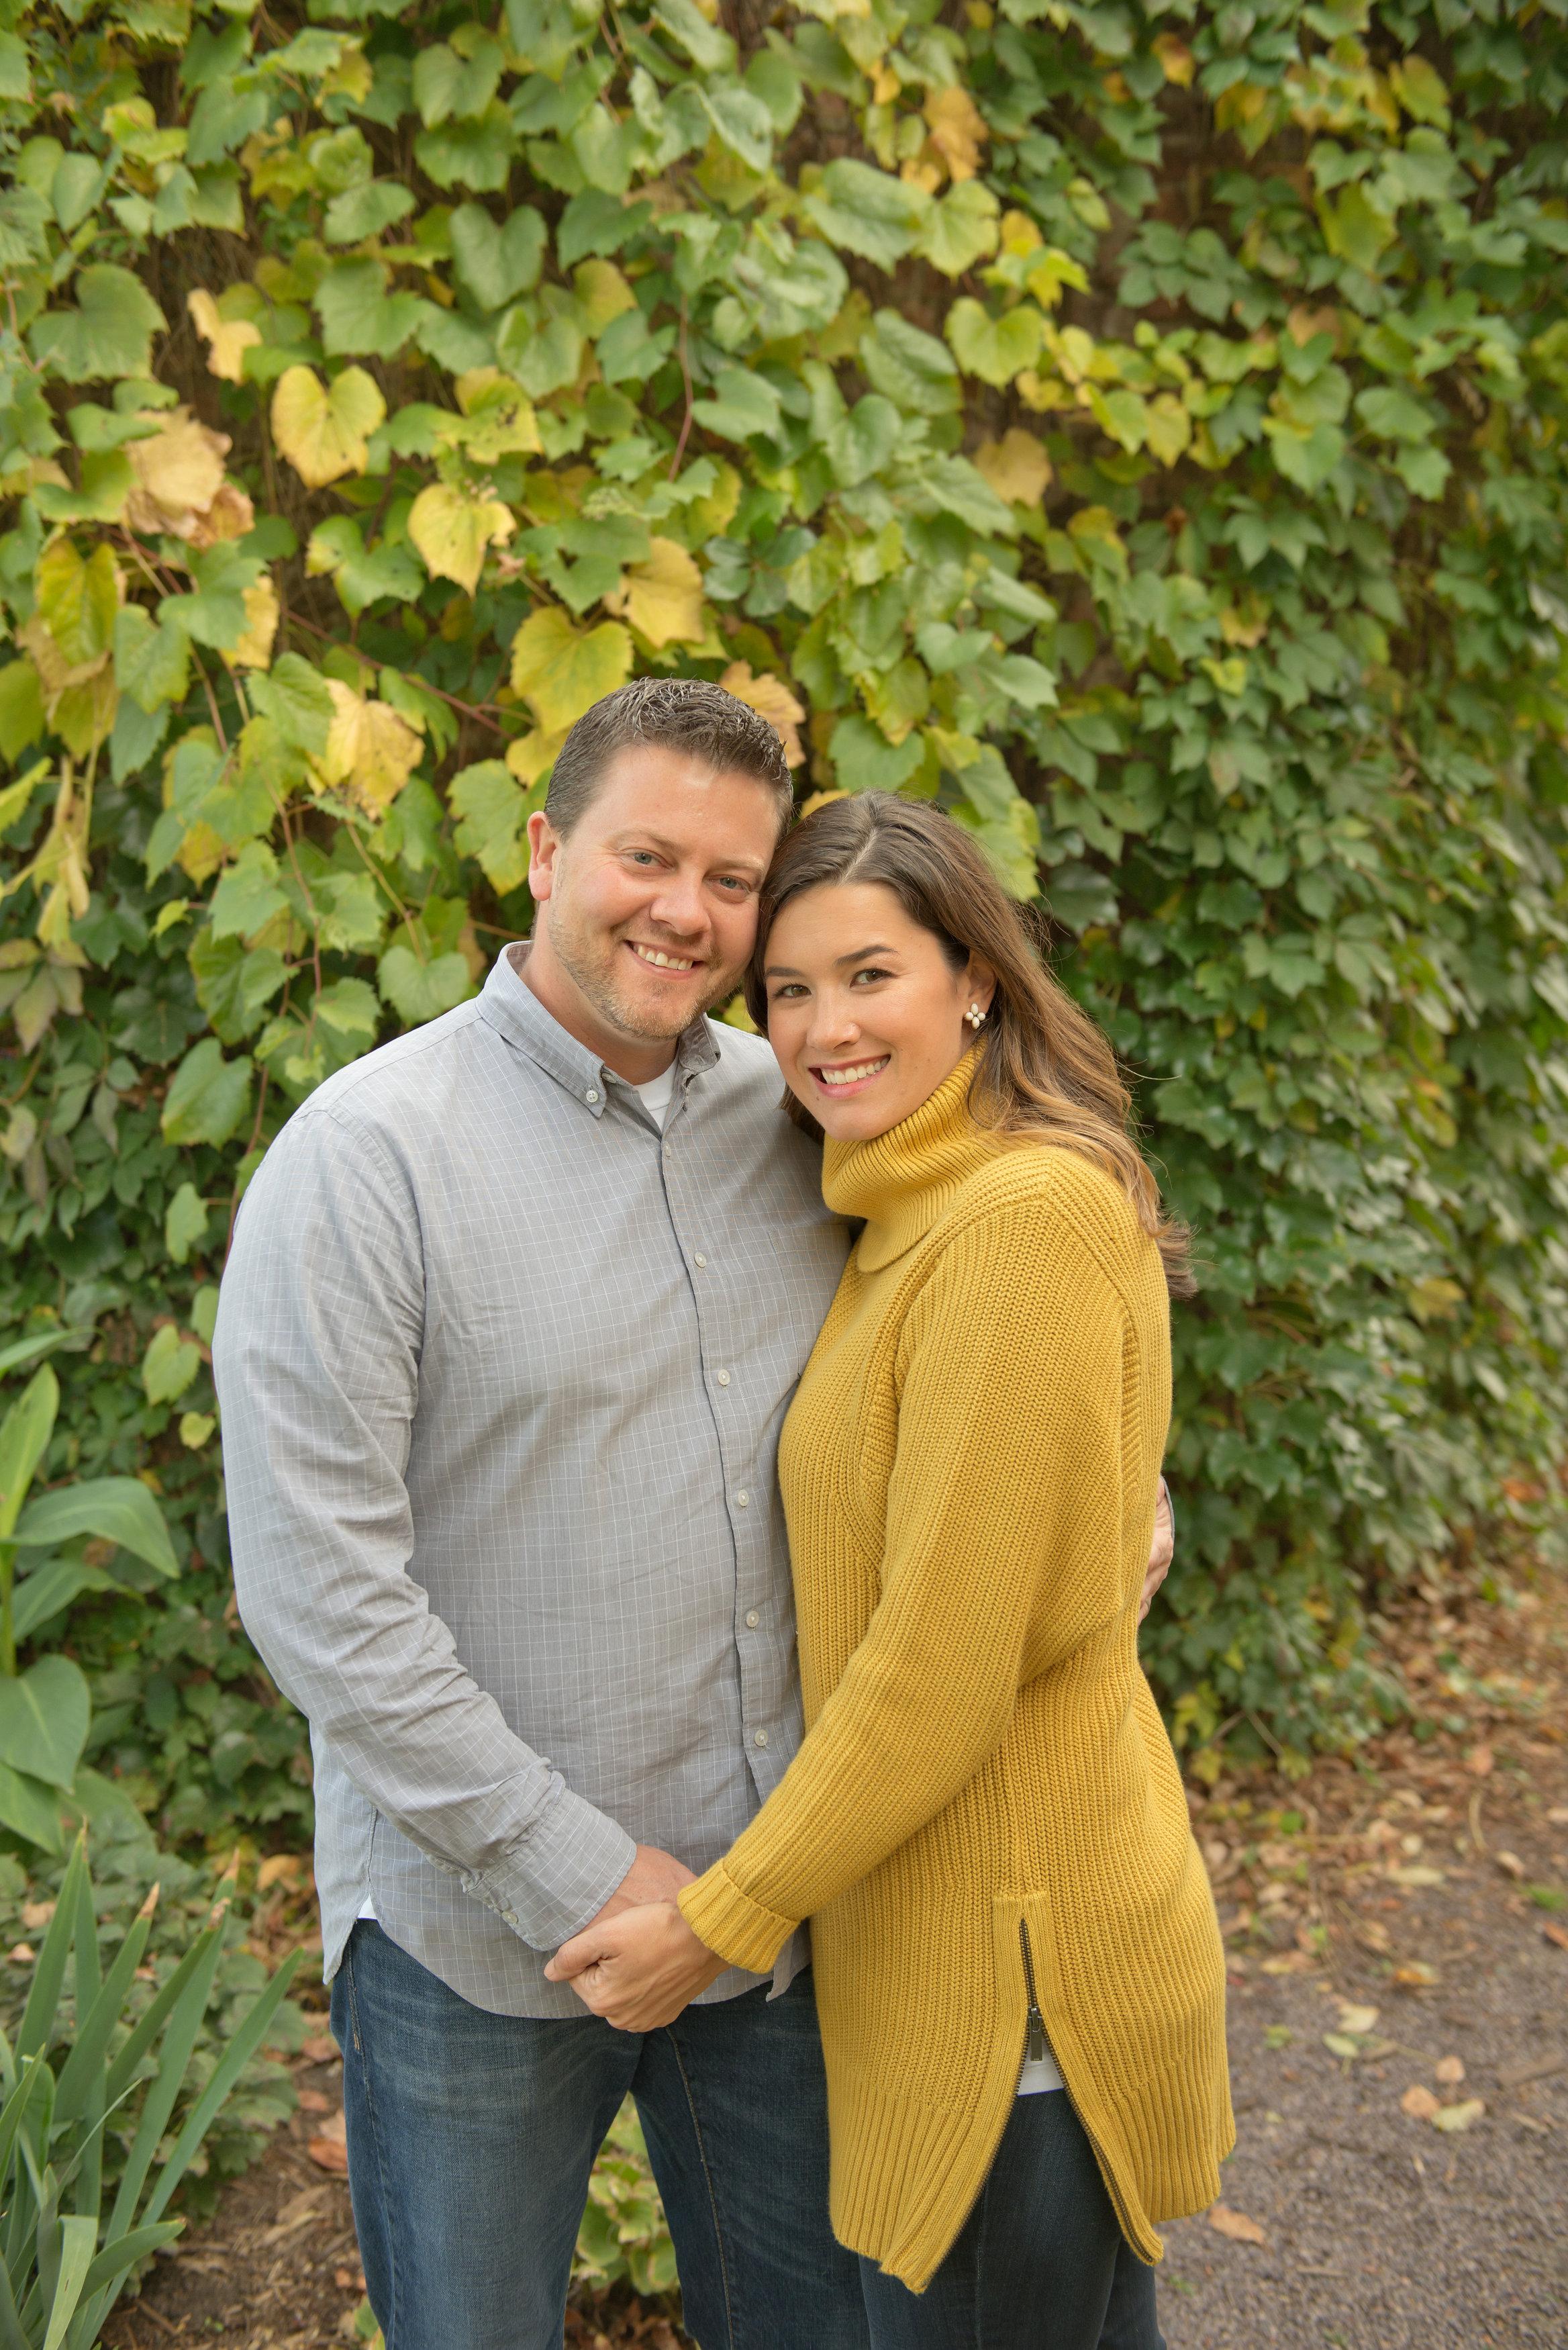 Orlando-couple-fall-vines.jpg